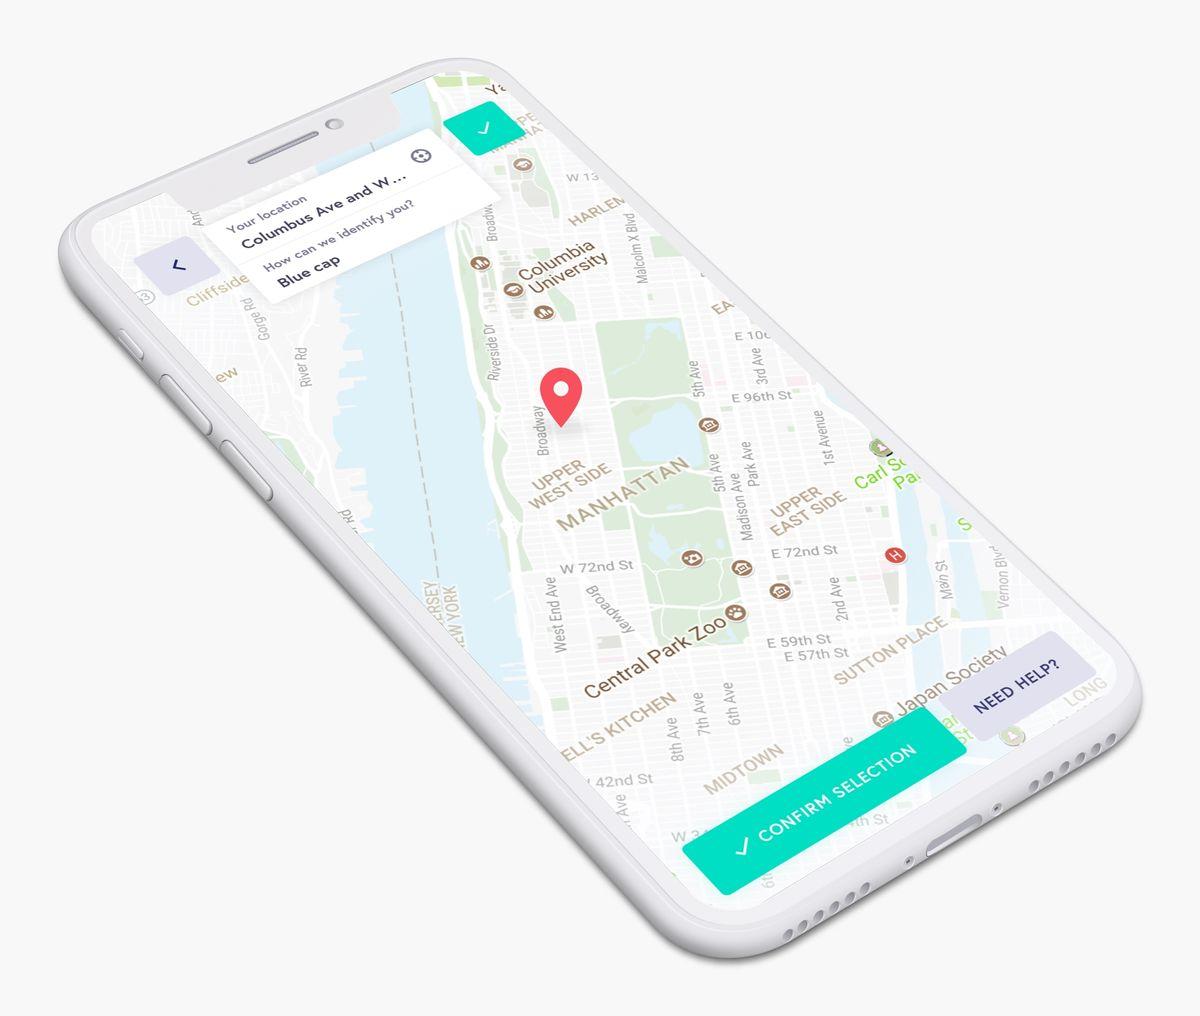 Ubermeds choose location